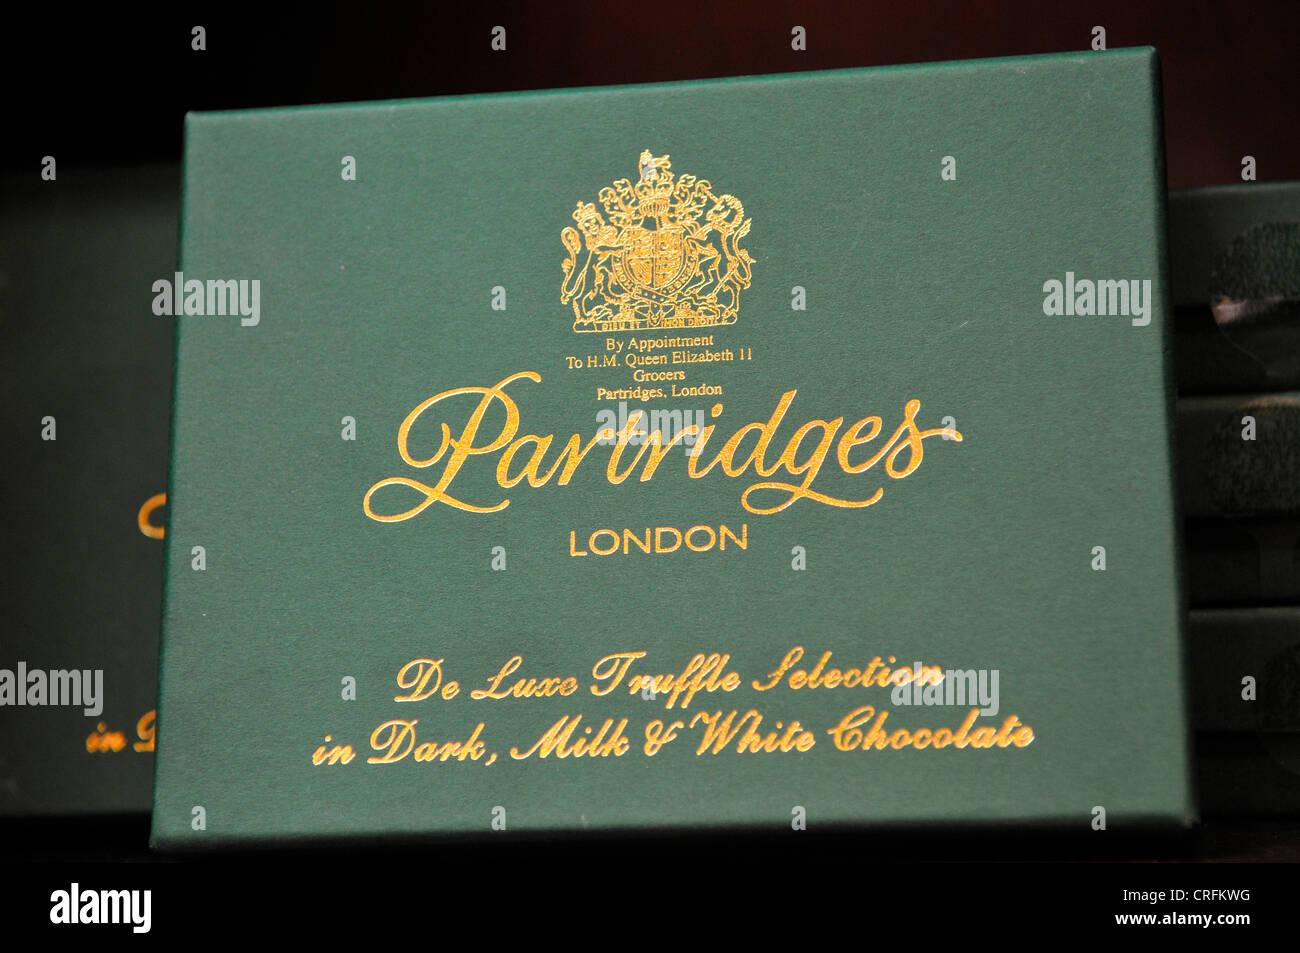 Box of Chocolates at Partridges Shop, Chelsea, London - Stock Image